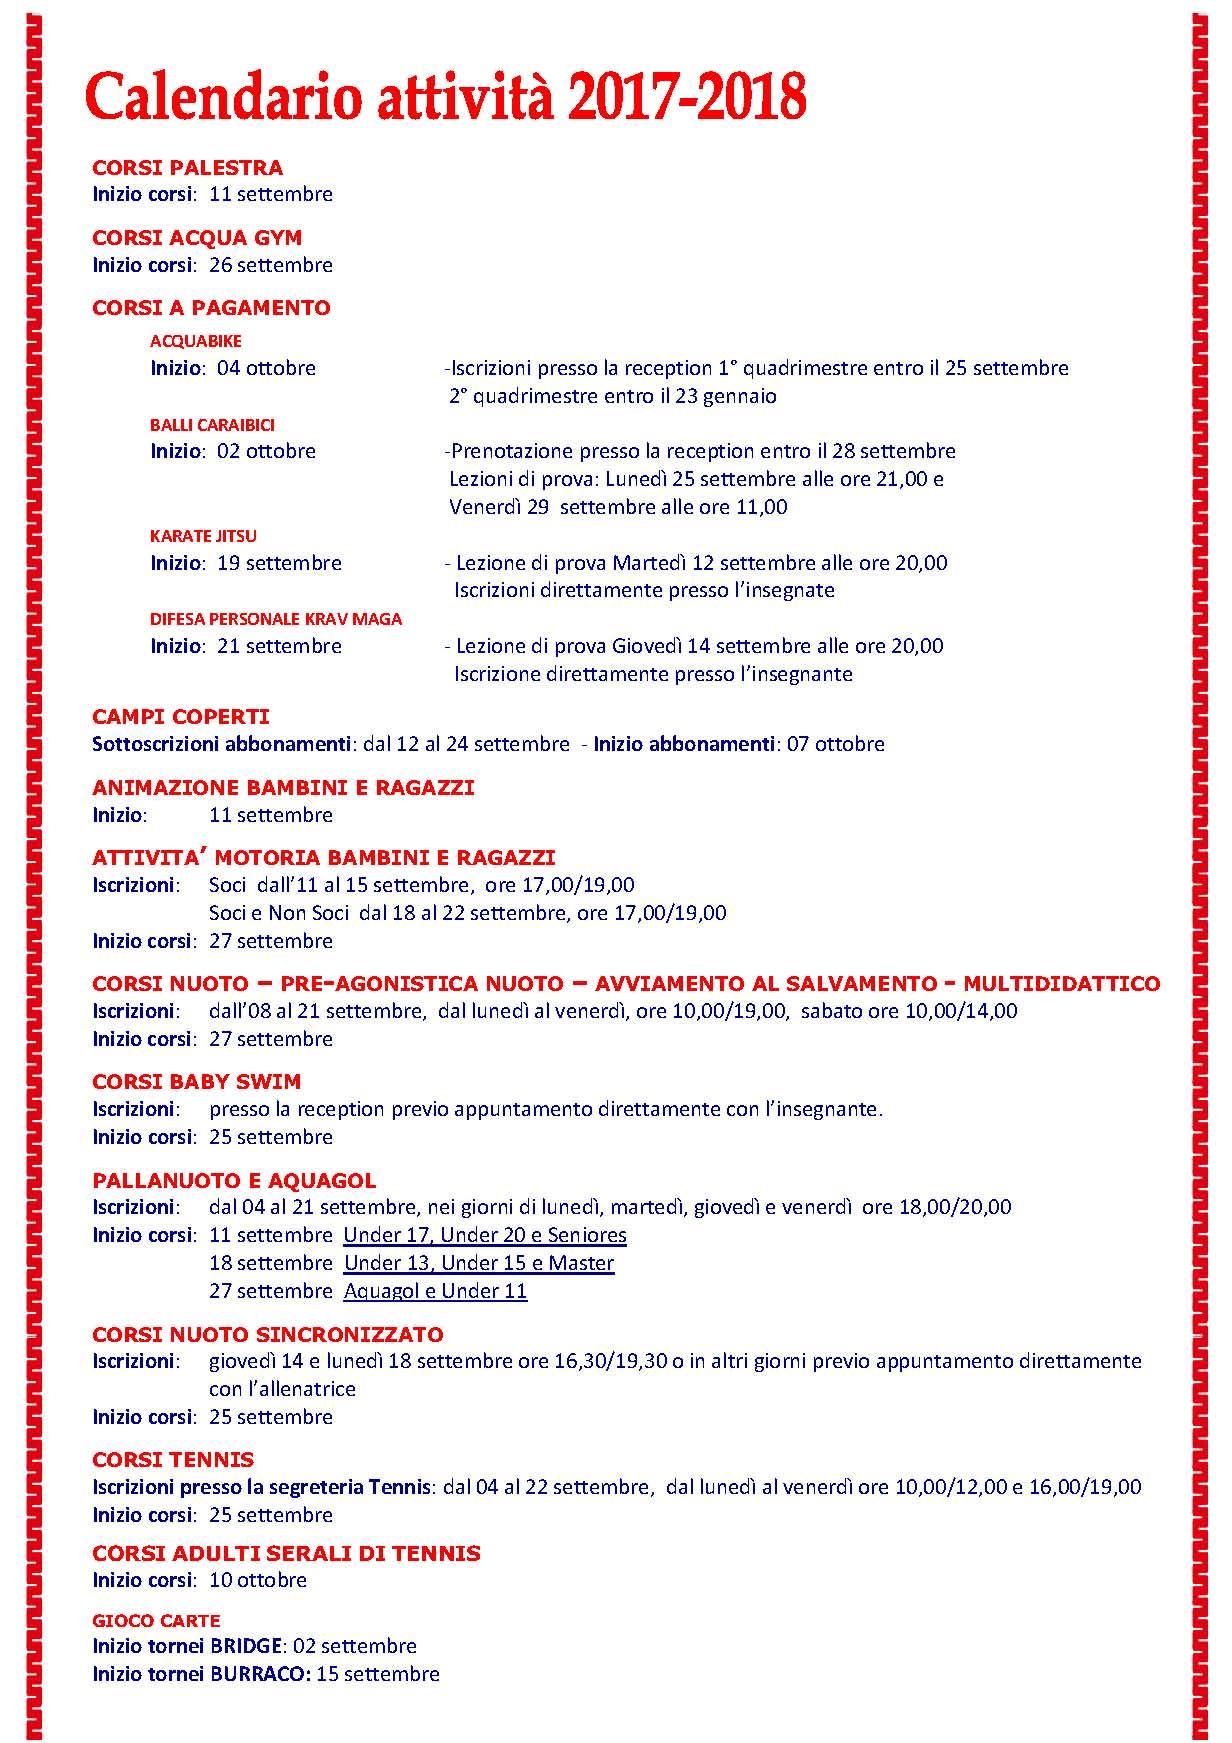 Calendario Milano.Sporting Club Milano 2 Calendario Attivita 2017 2018